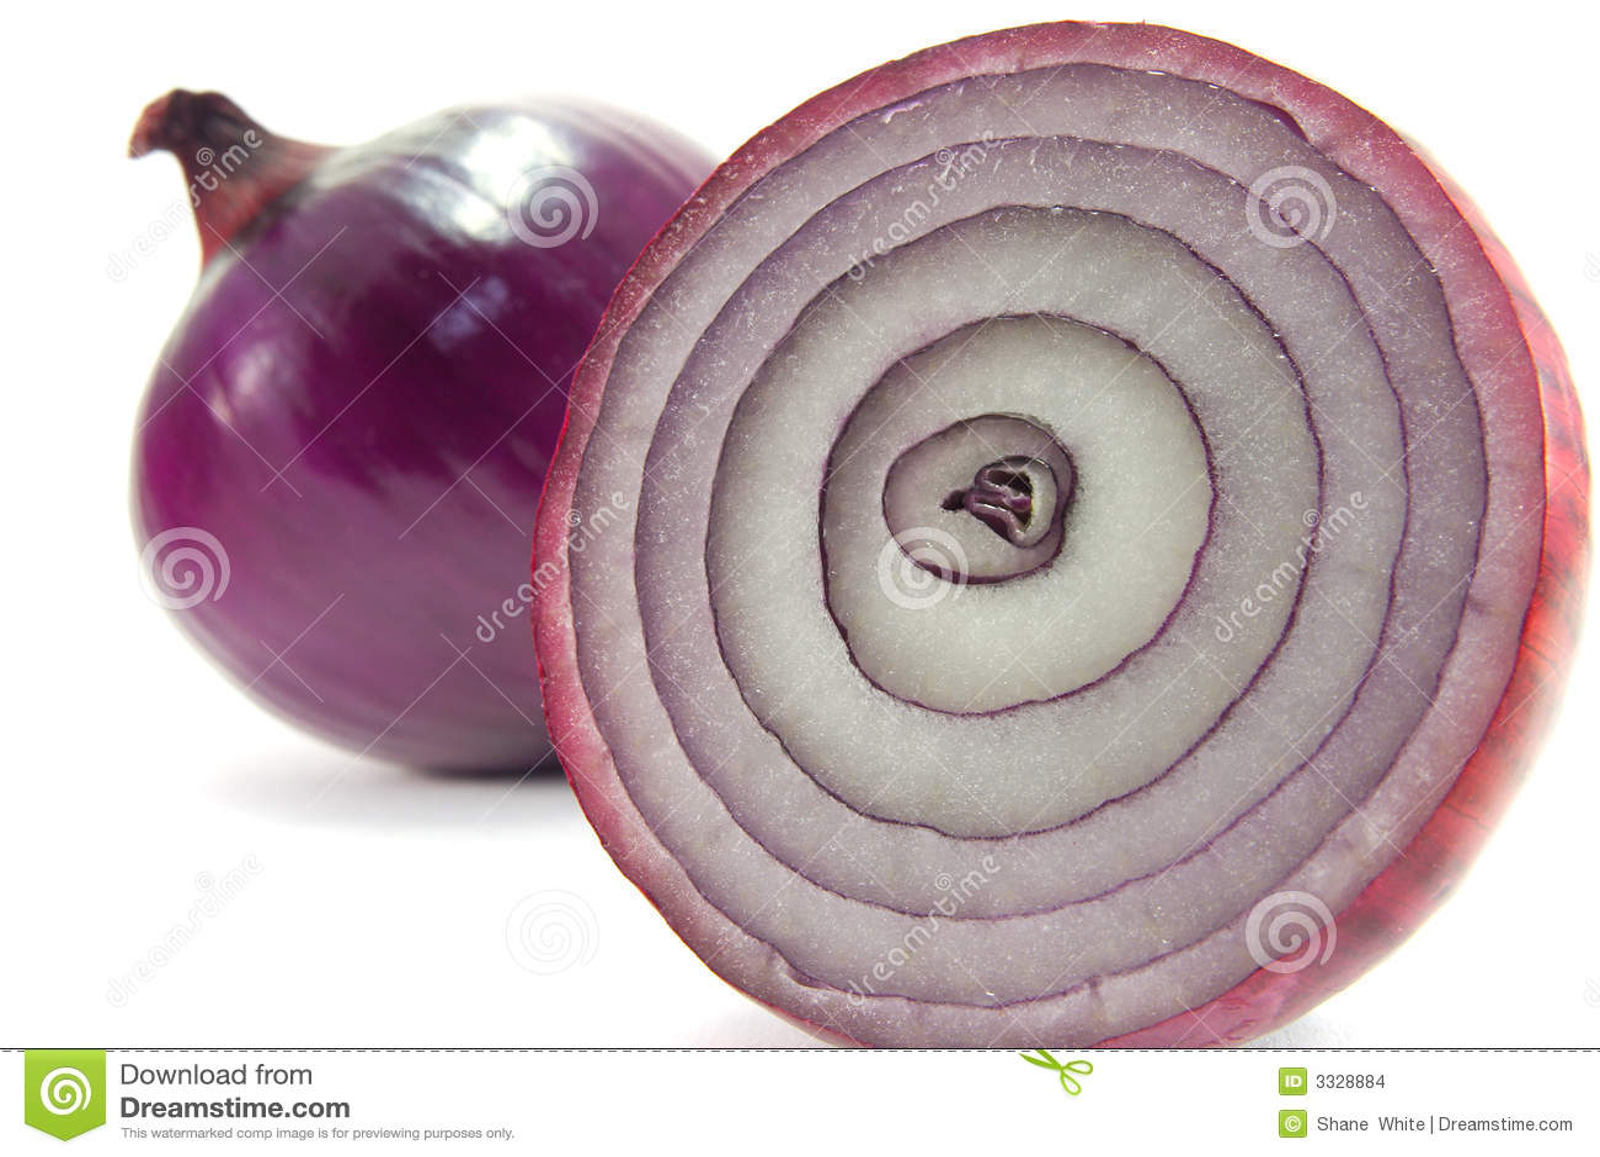 how to grow spanish onions